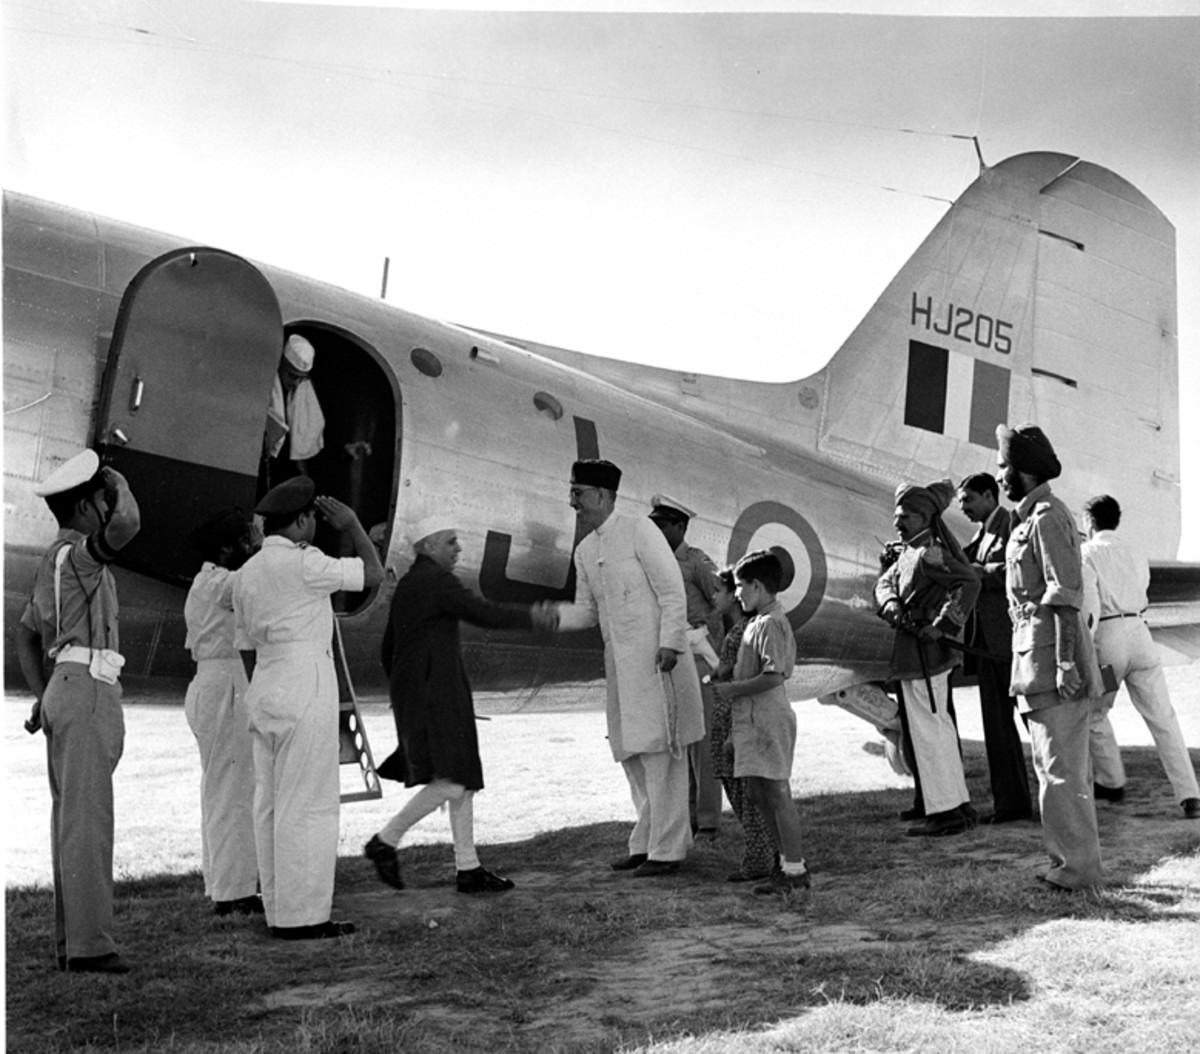 Sheikh Abdullah receiving Nehru in Srinagar, 1947